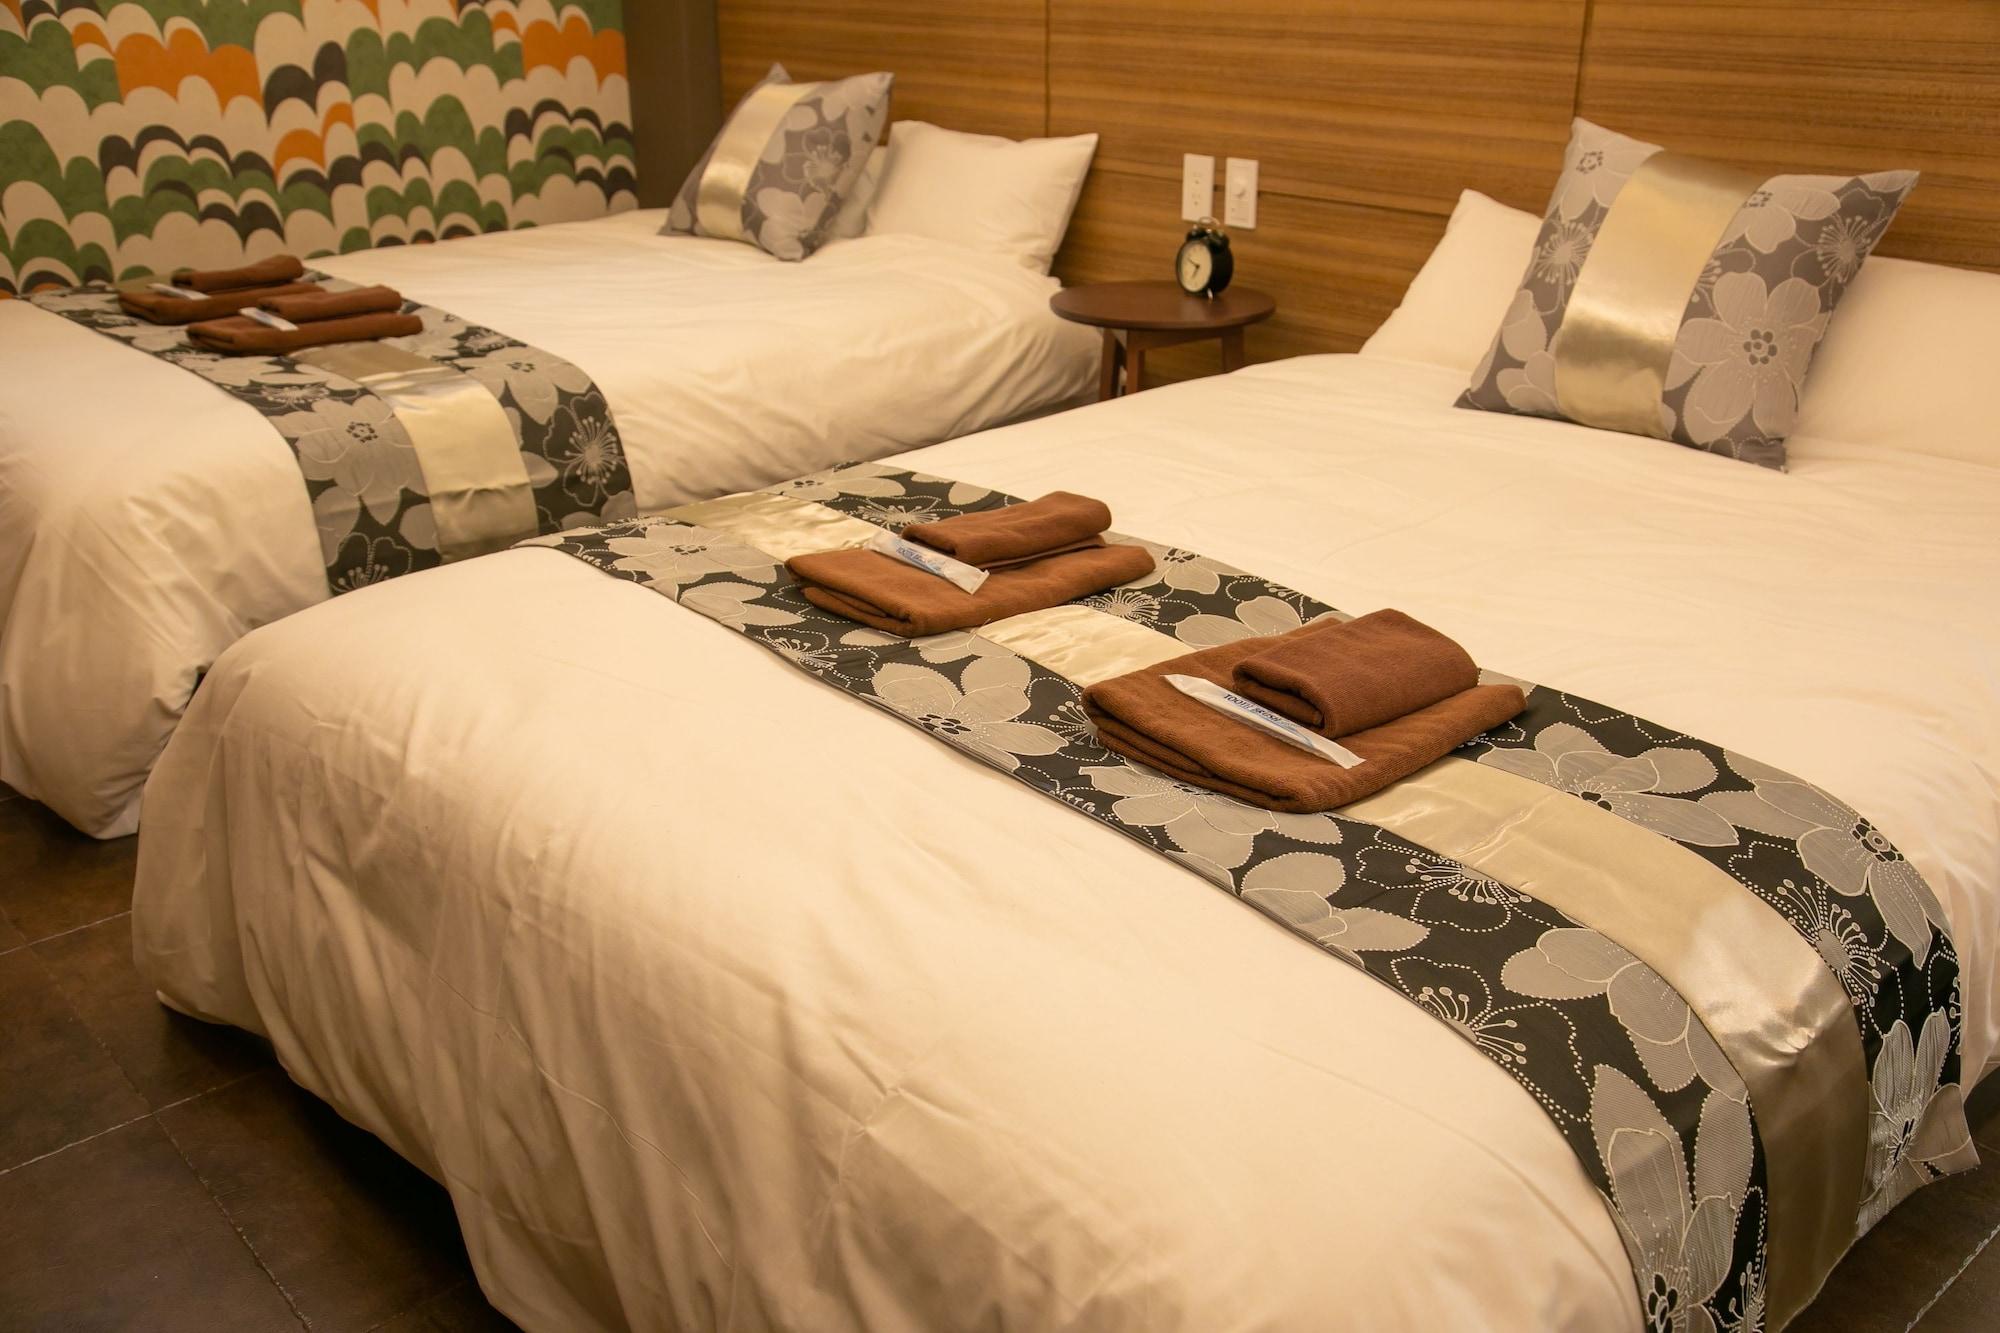 IKIDANE Residential Hotel Higashi Ikebukuro, Toshima